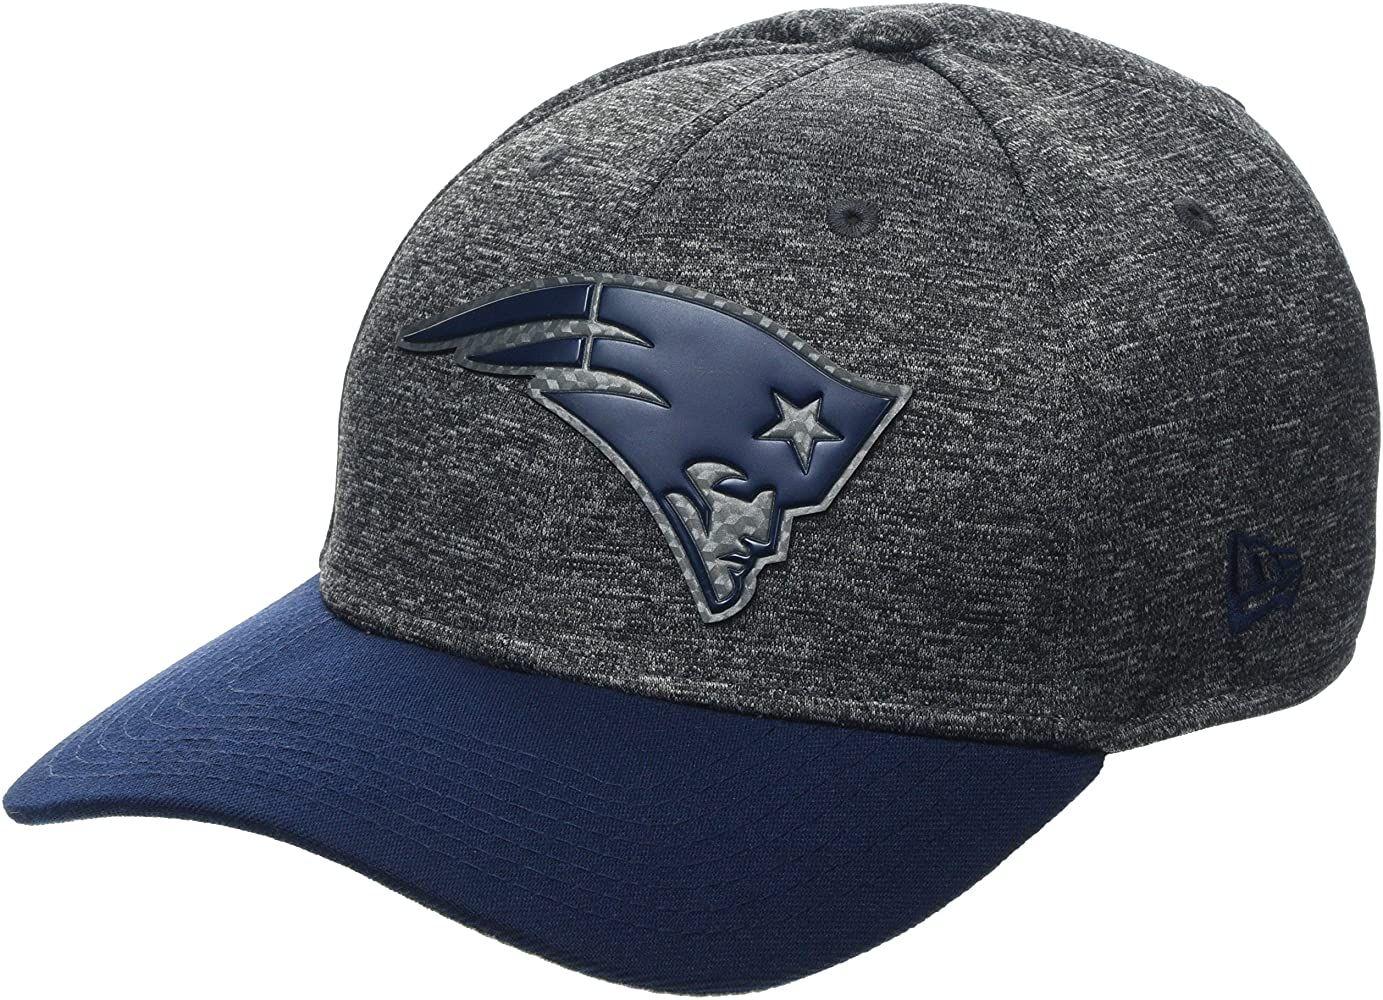 Gorra New England Patriots (Talla M-L)